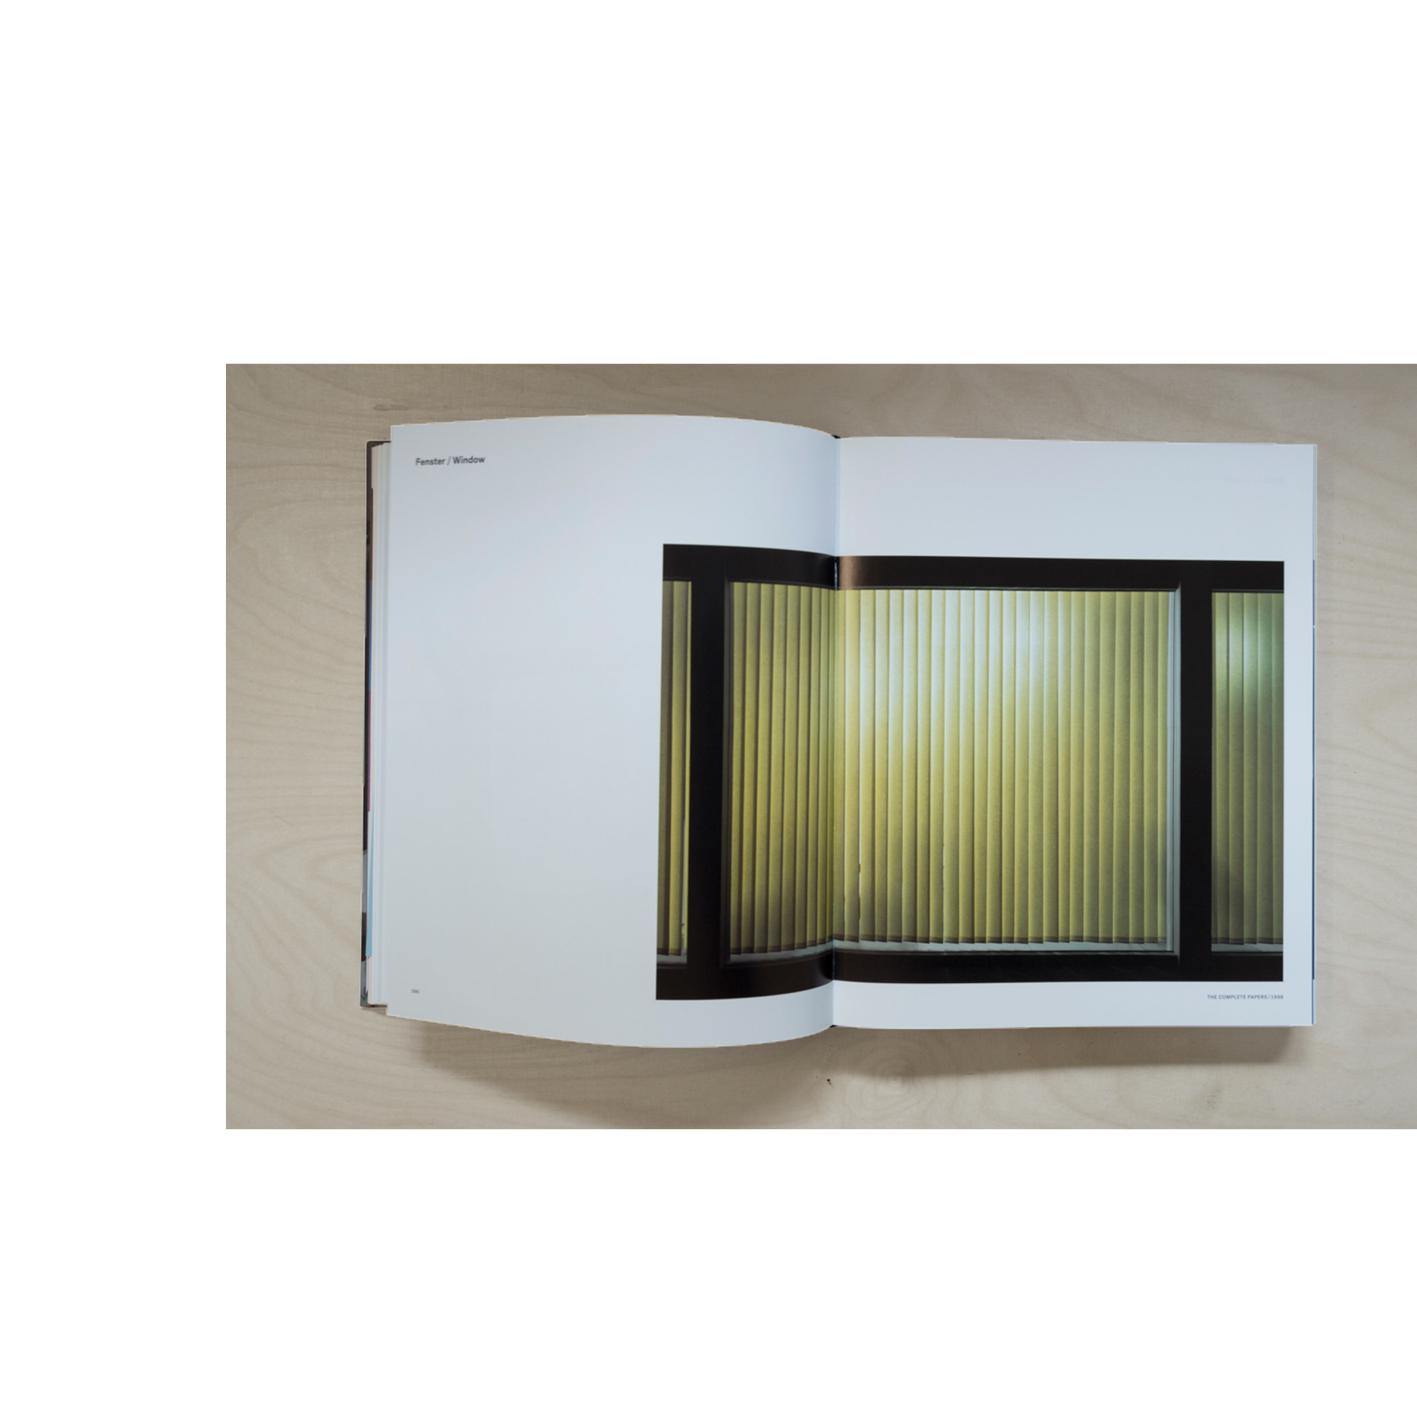 Thomas Demand, Fenster (1998)